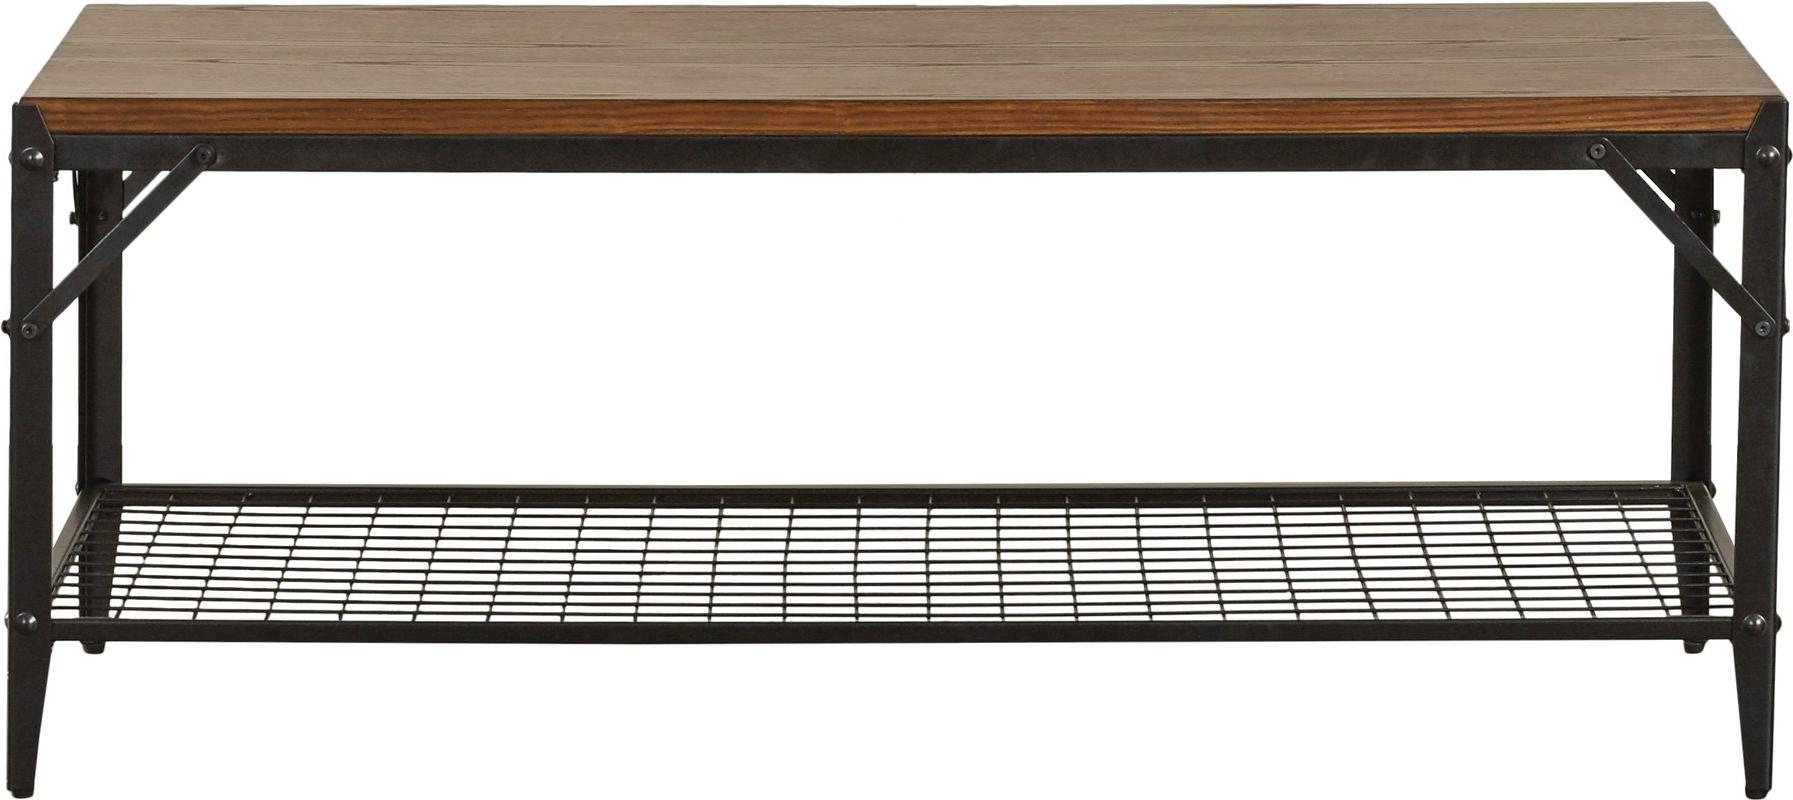 Moraga Live Edge 8 Door Sideboards Throughout Trendy Trent Austin Design Moraga 3 Piece Coffee Table Set & Reviews (View 18 of 20)